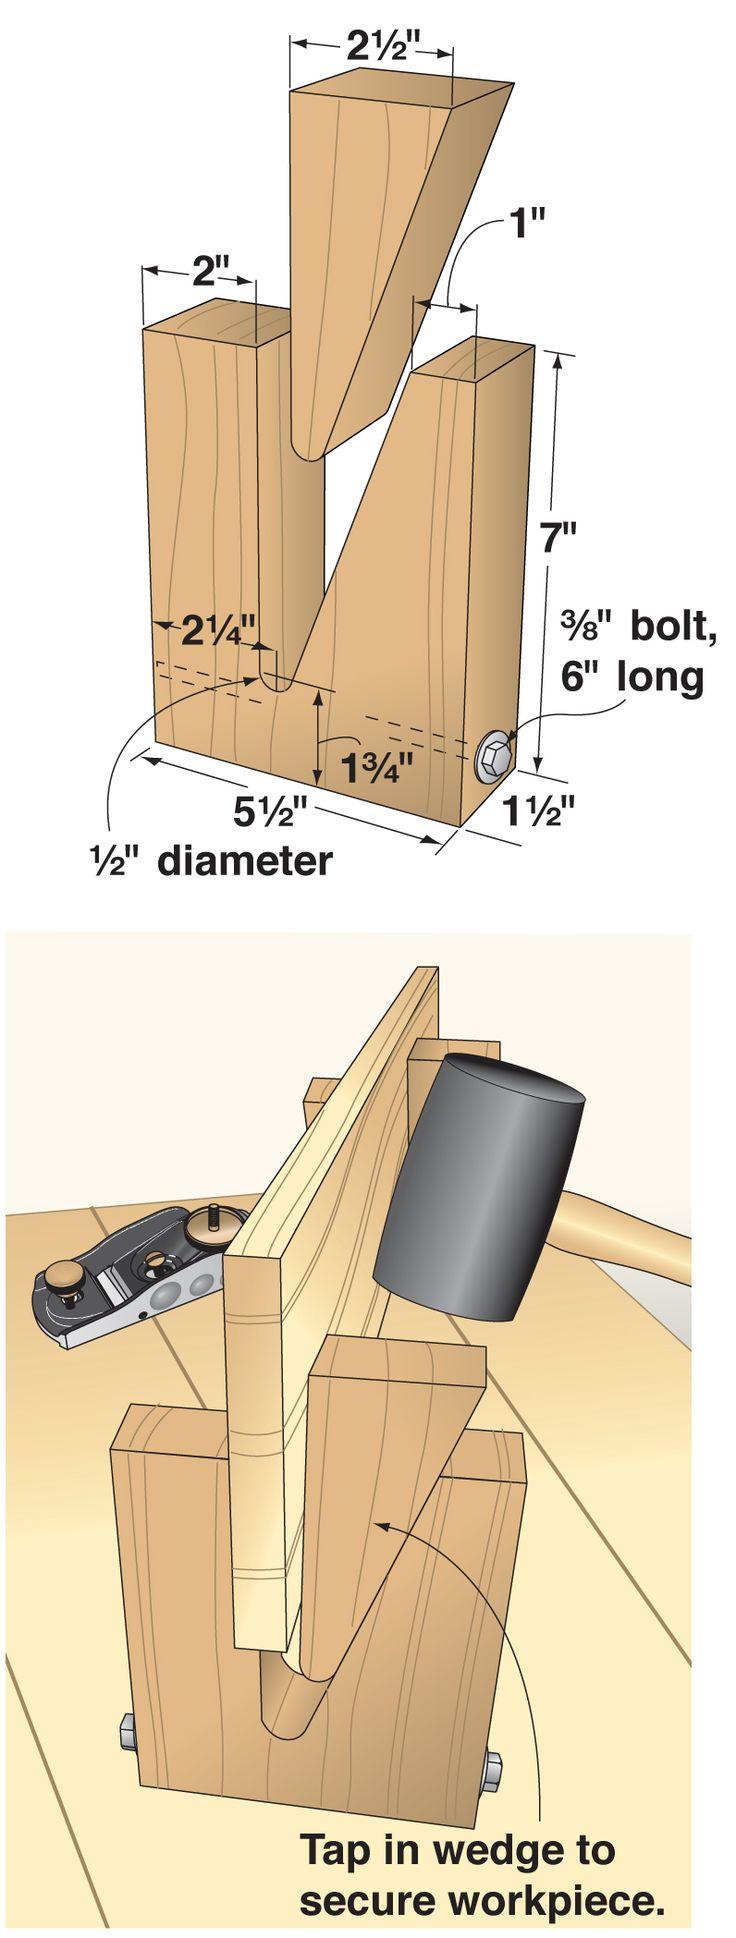 Must bottom hole make up tool